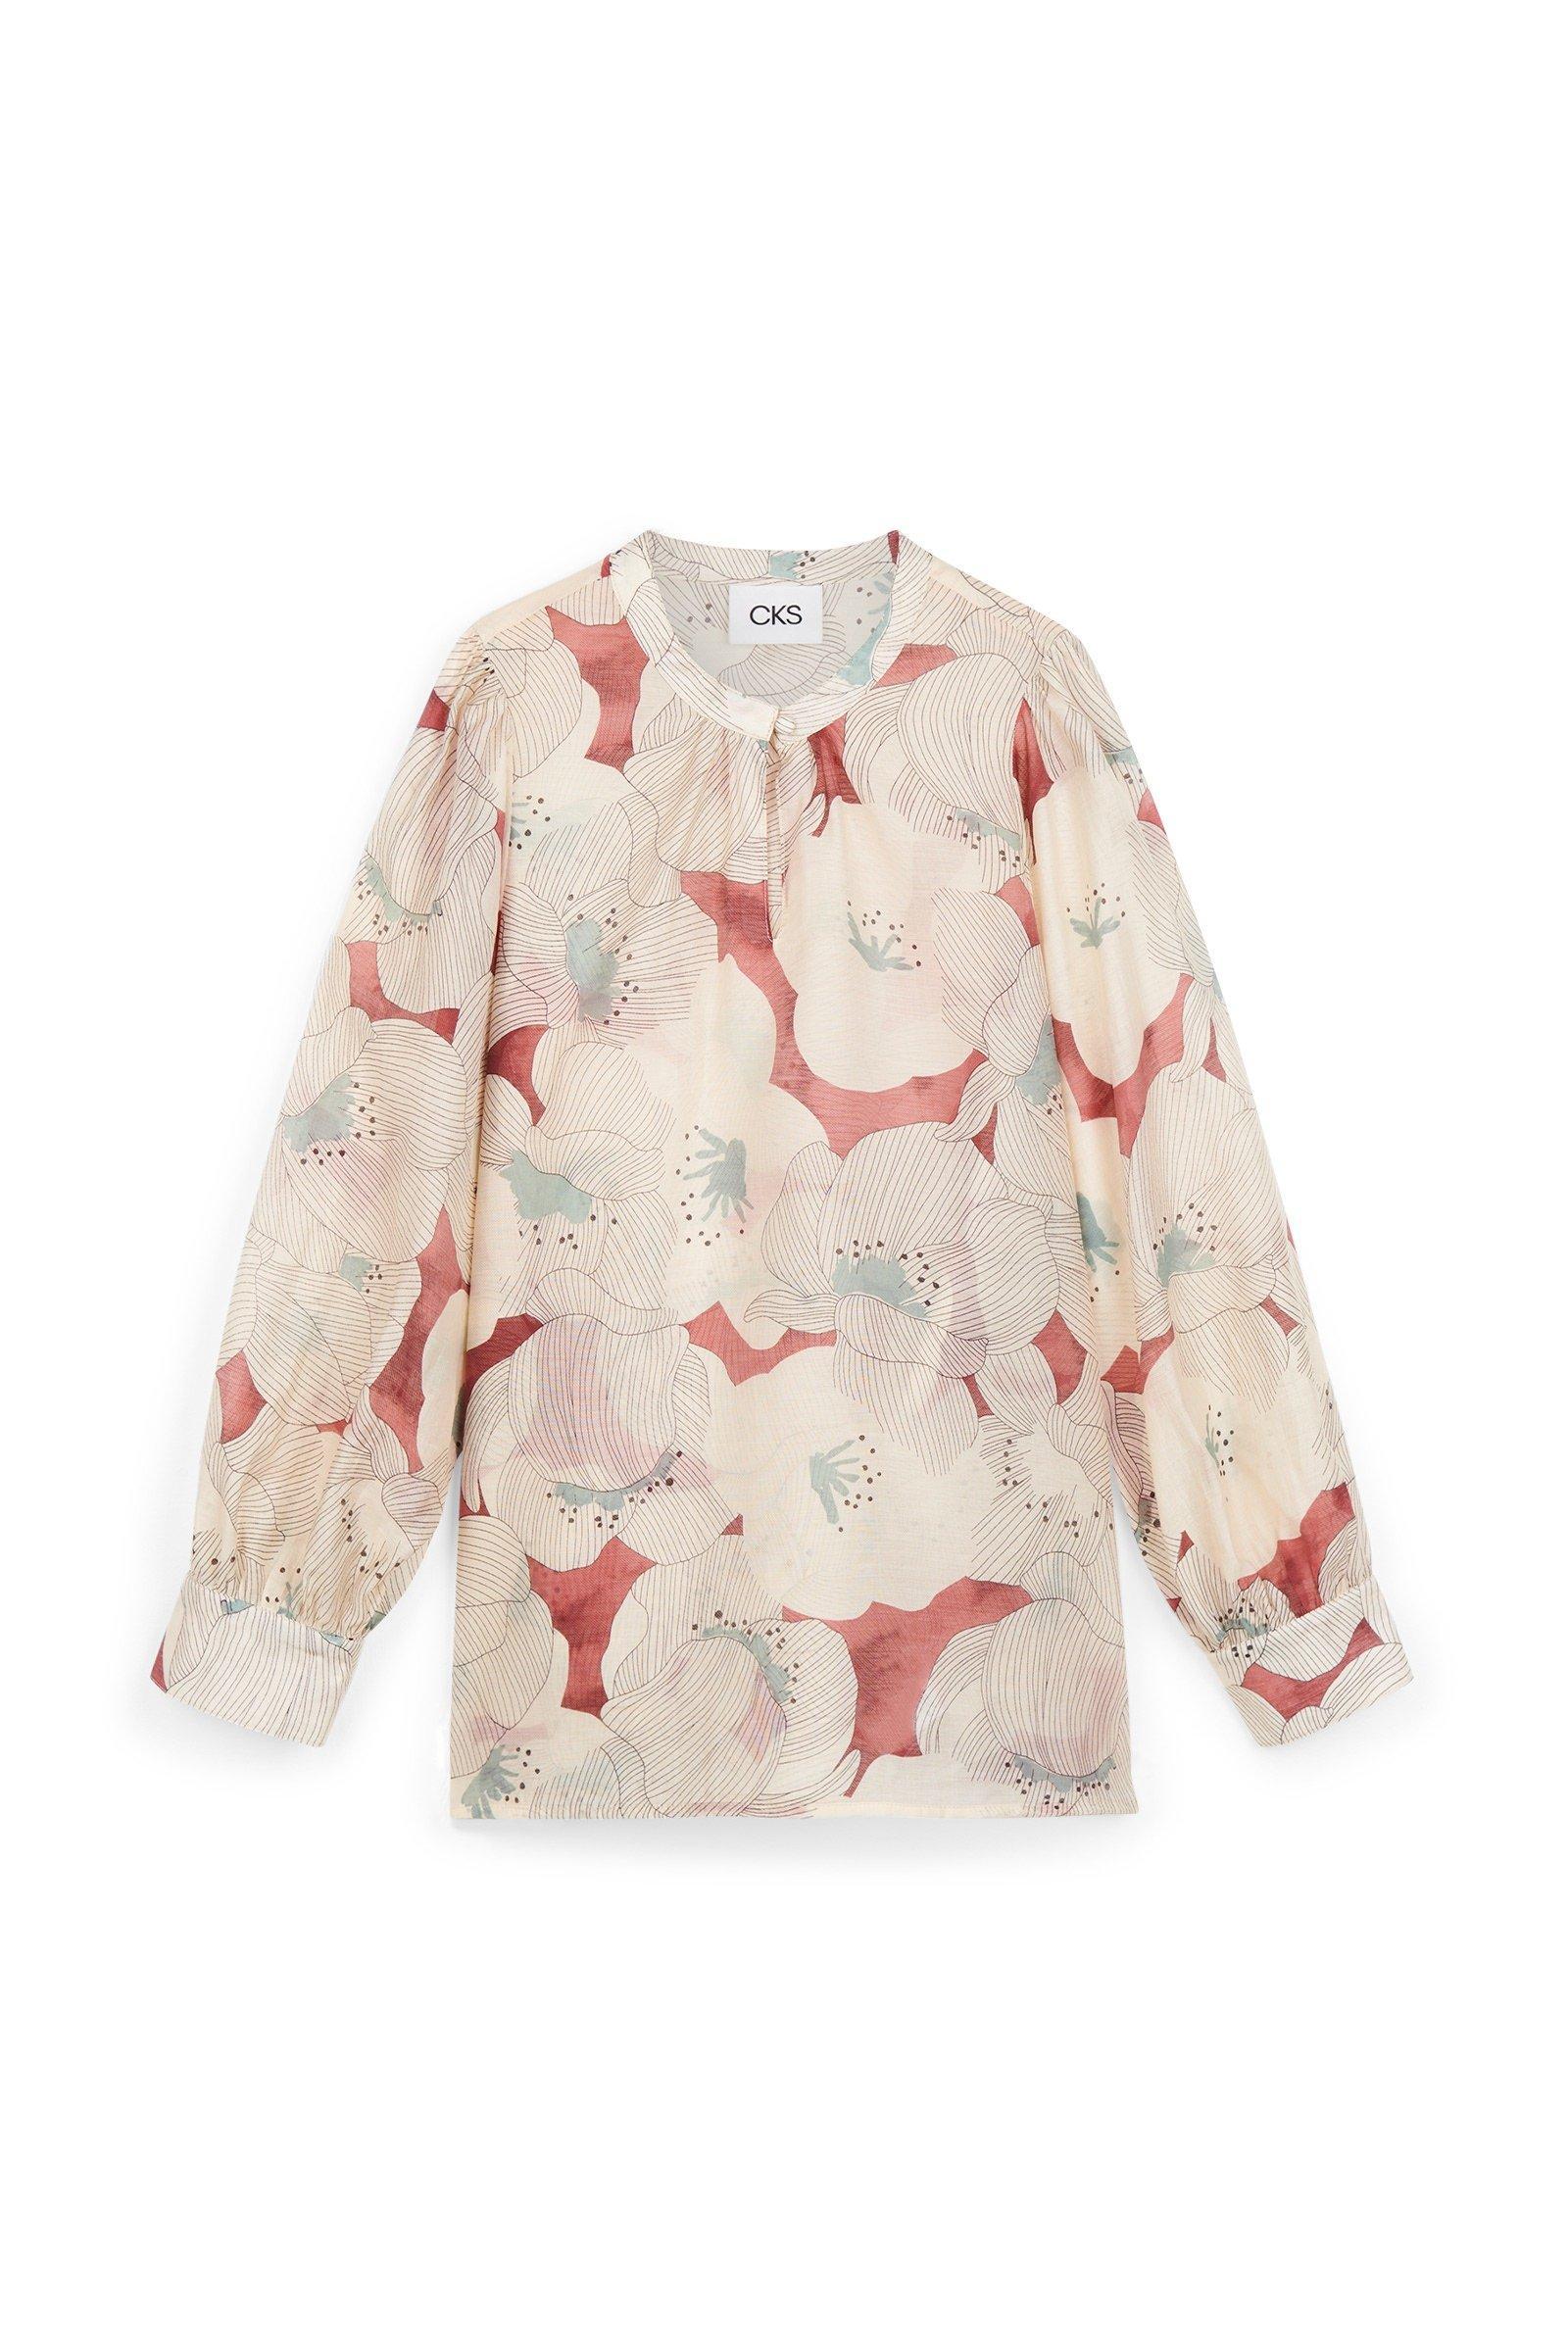 CKS Dames - MICKEY - blouse korte mouwen - meerkleurig